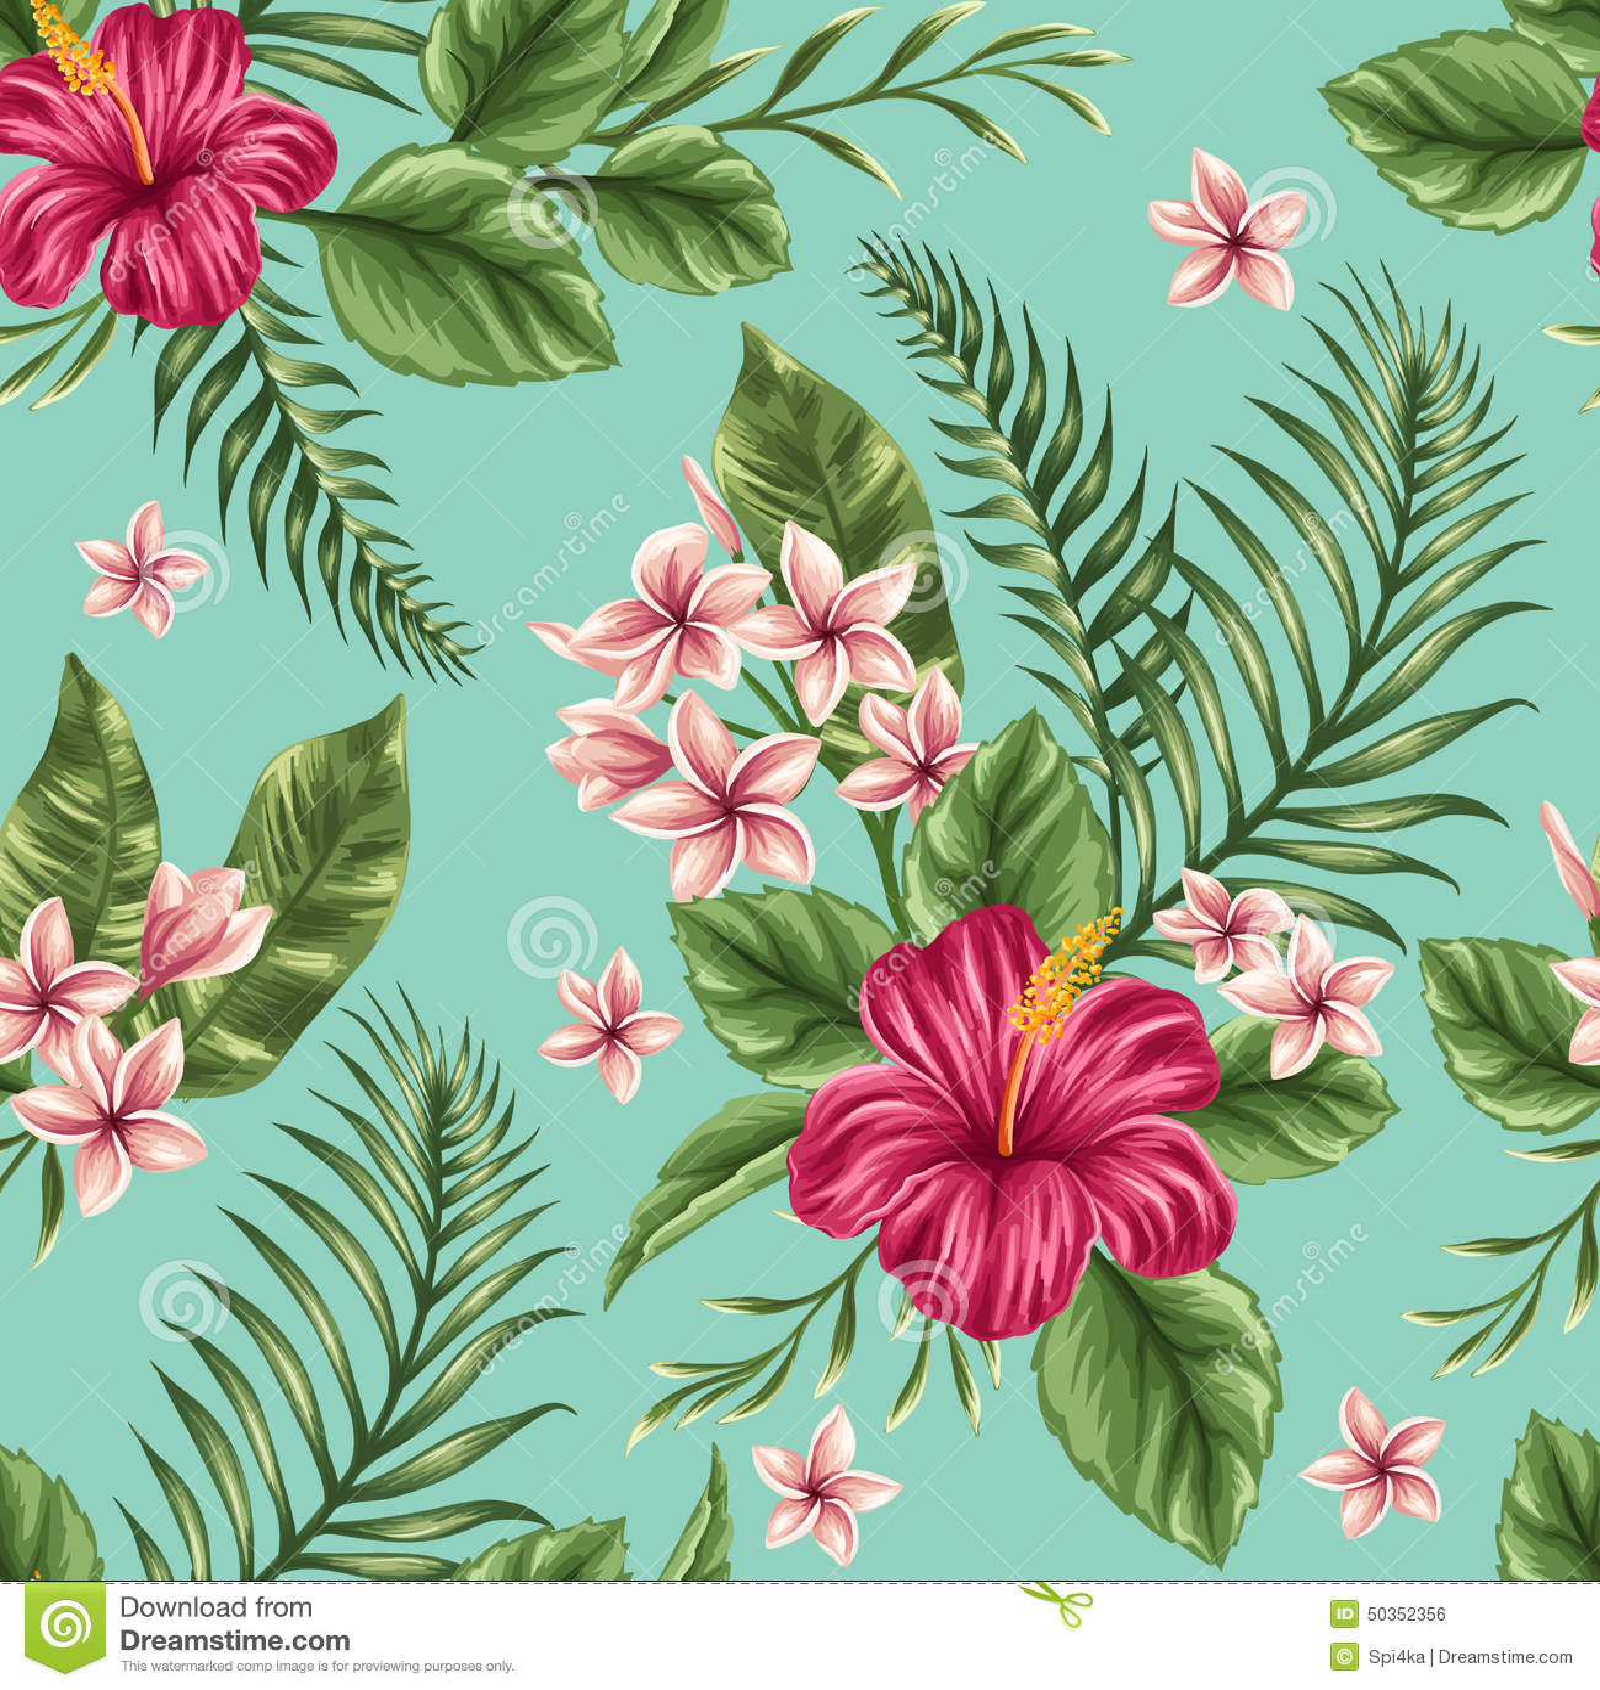 Scandinavian Design Floral Seamless Pattern Stock Vector Image 50352356